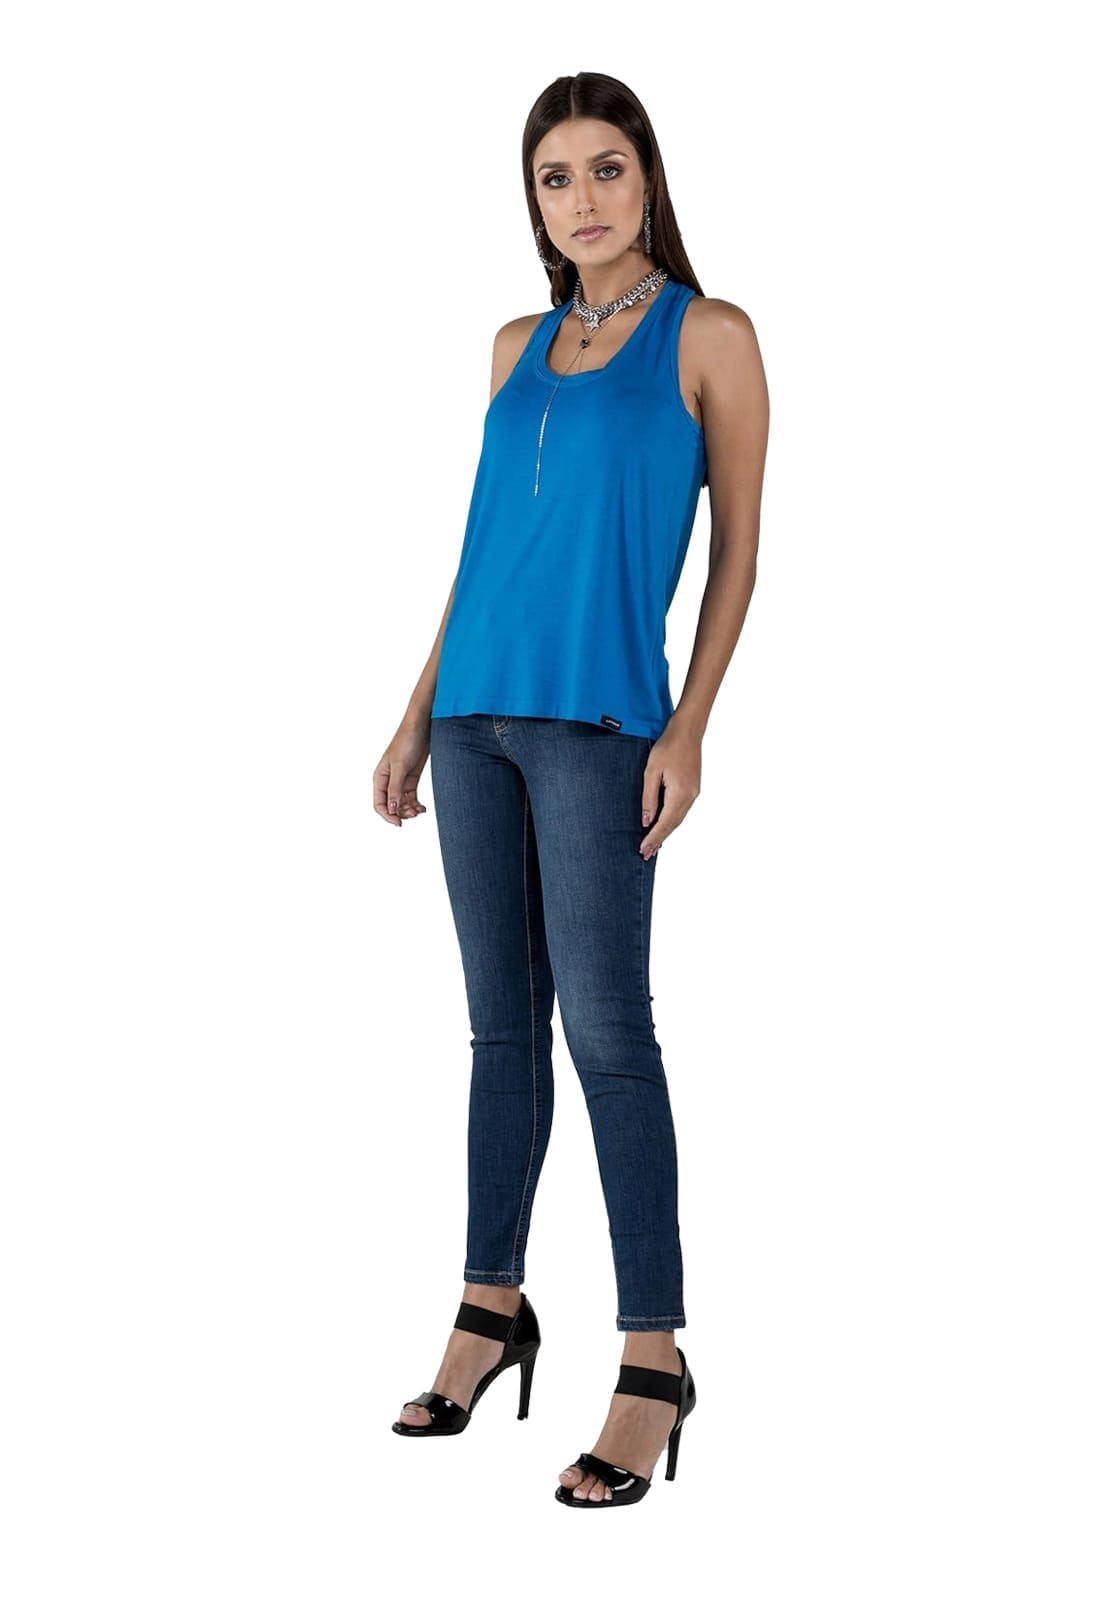 2 Regatas Feminina Latifundio - Cores Laranja e Azul